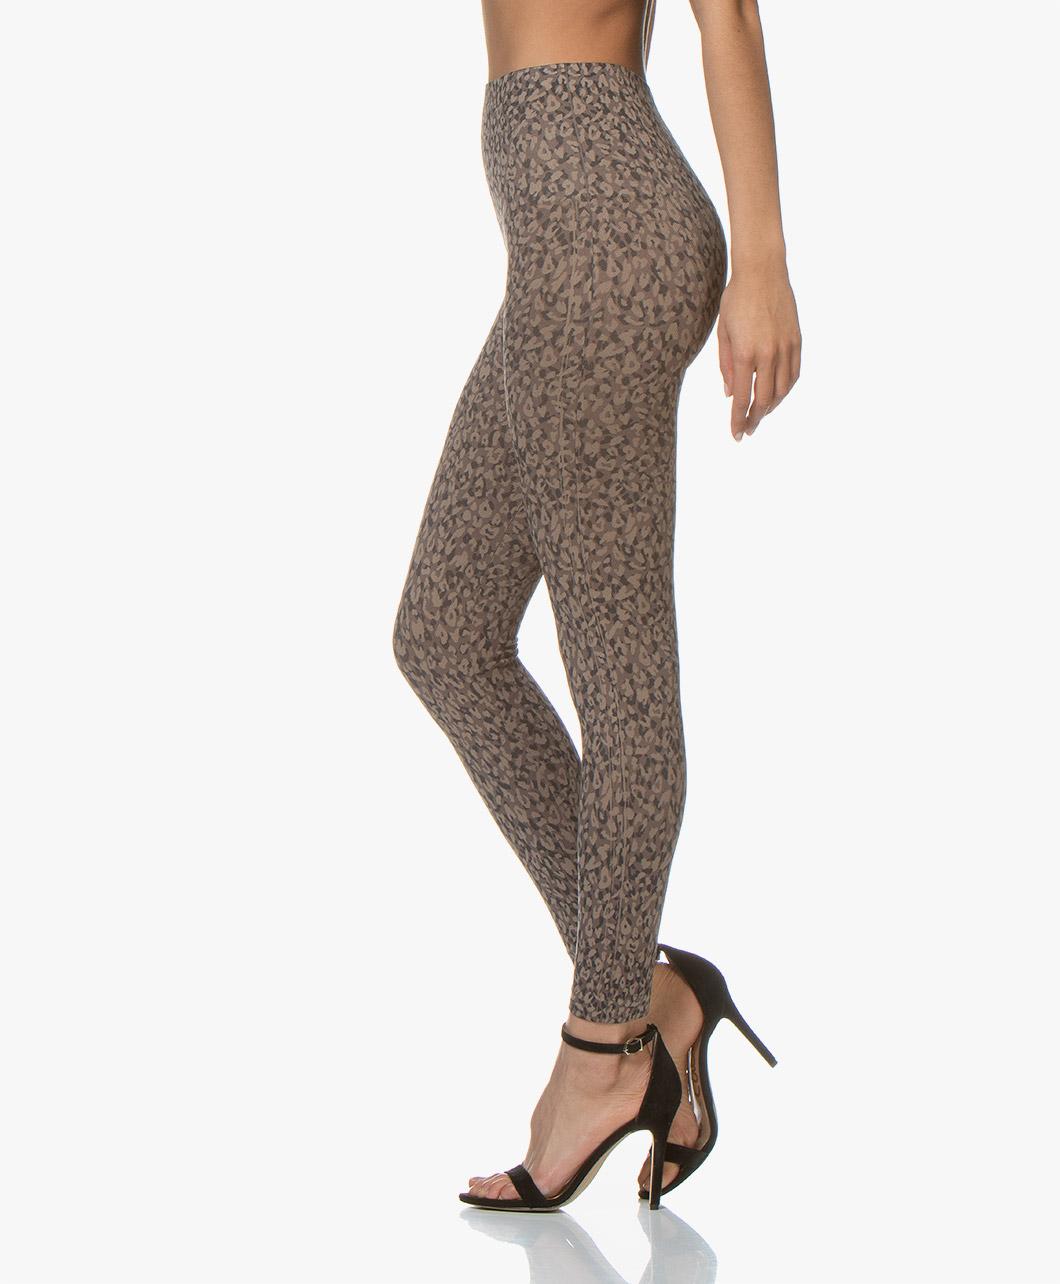 addcdf917c916a SPANX® Look At Me Now Leggings - Mini Leopard - Spanx Shapewear